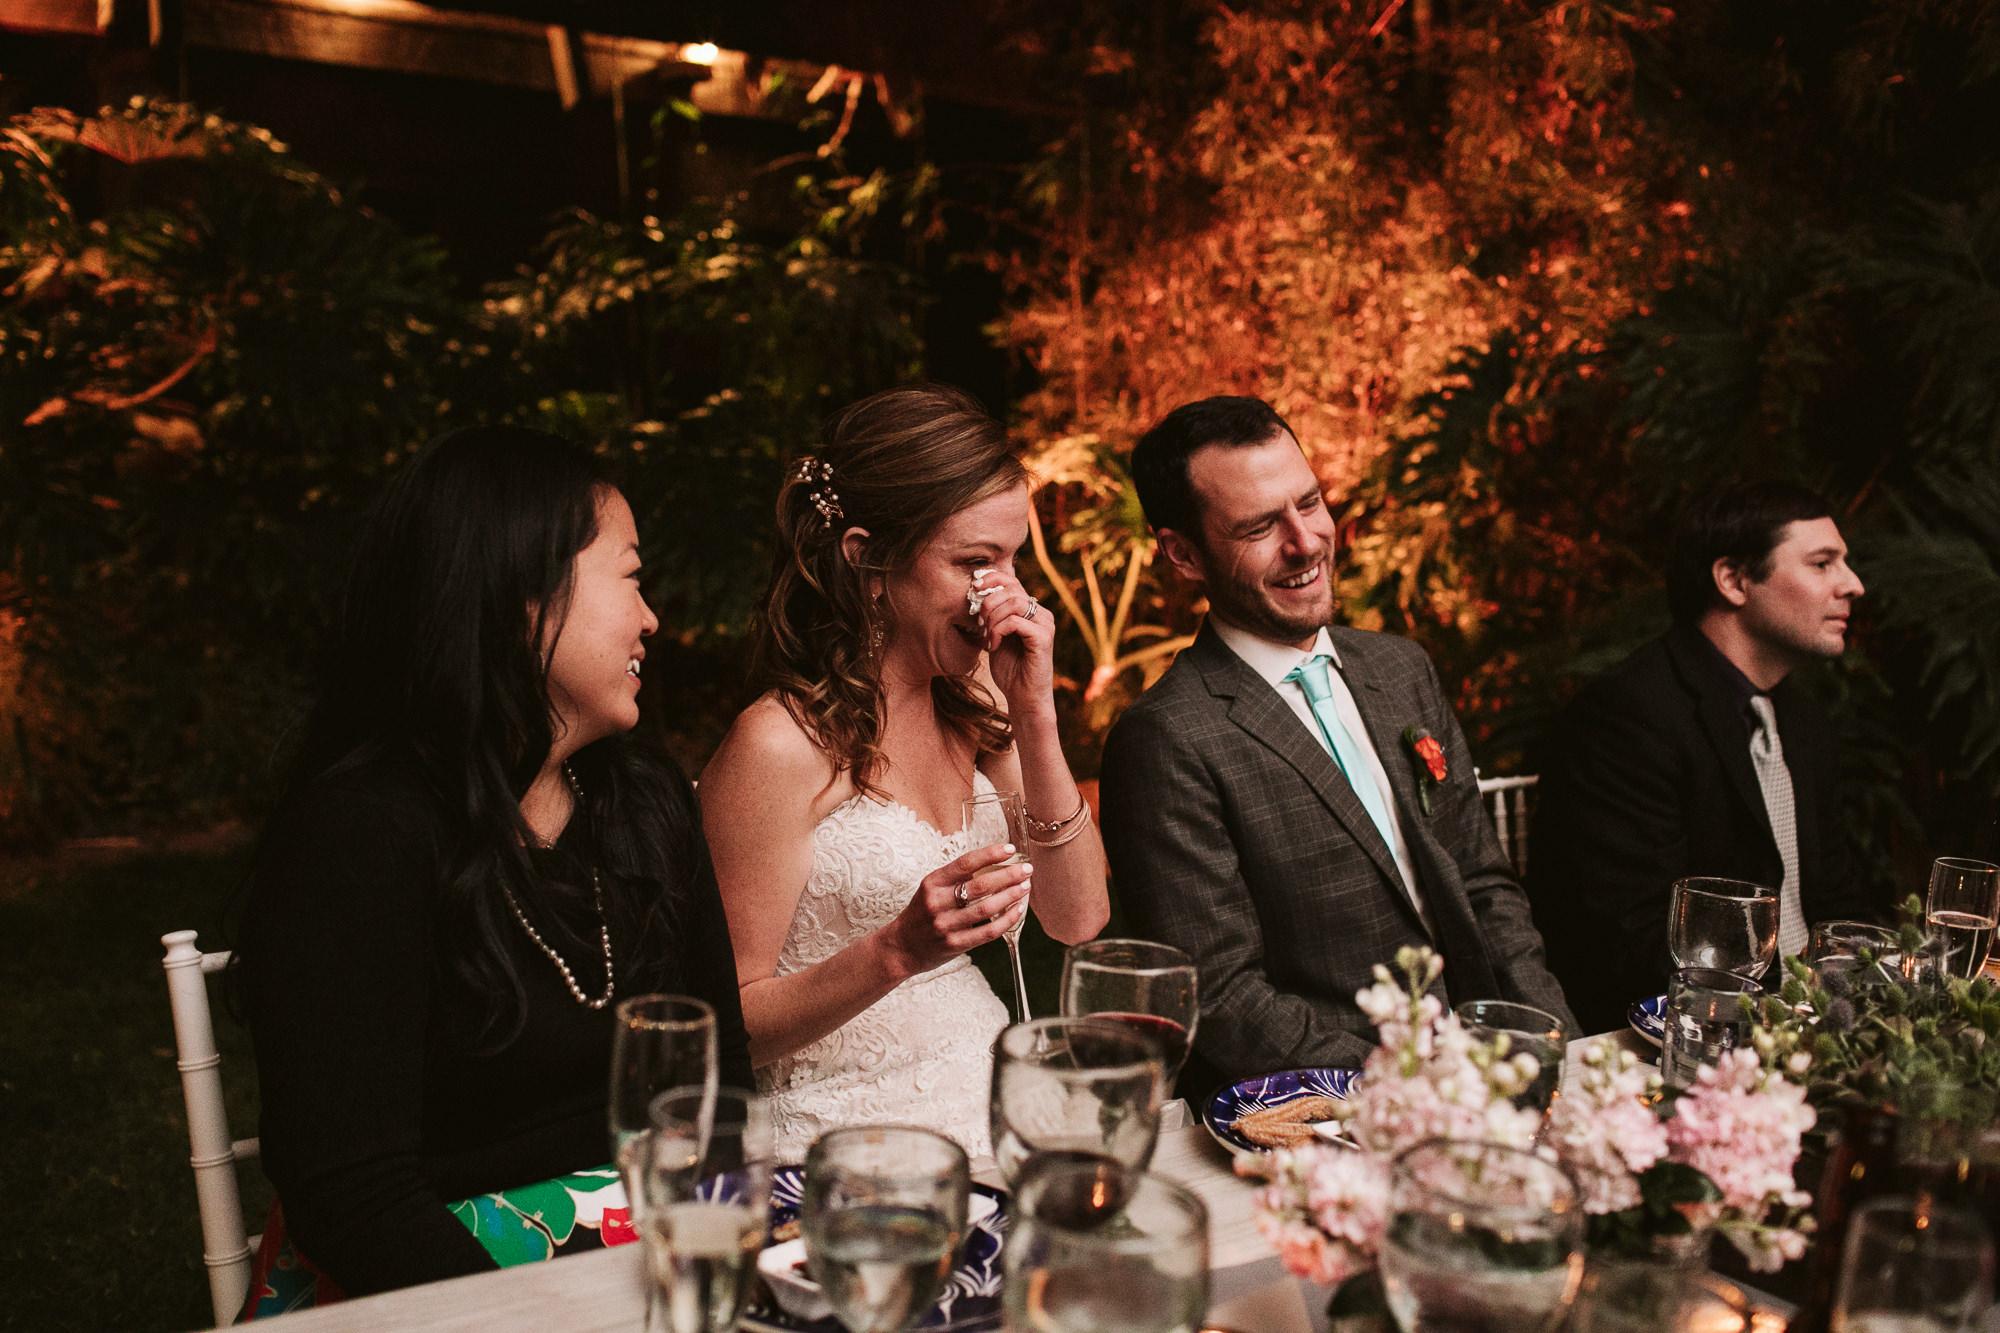 Destination-wedding-photographer-195.jpg